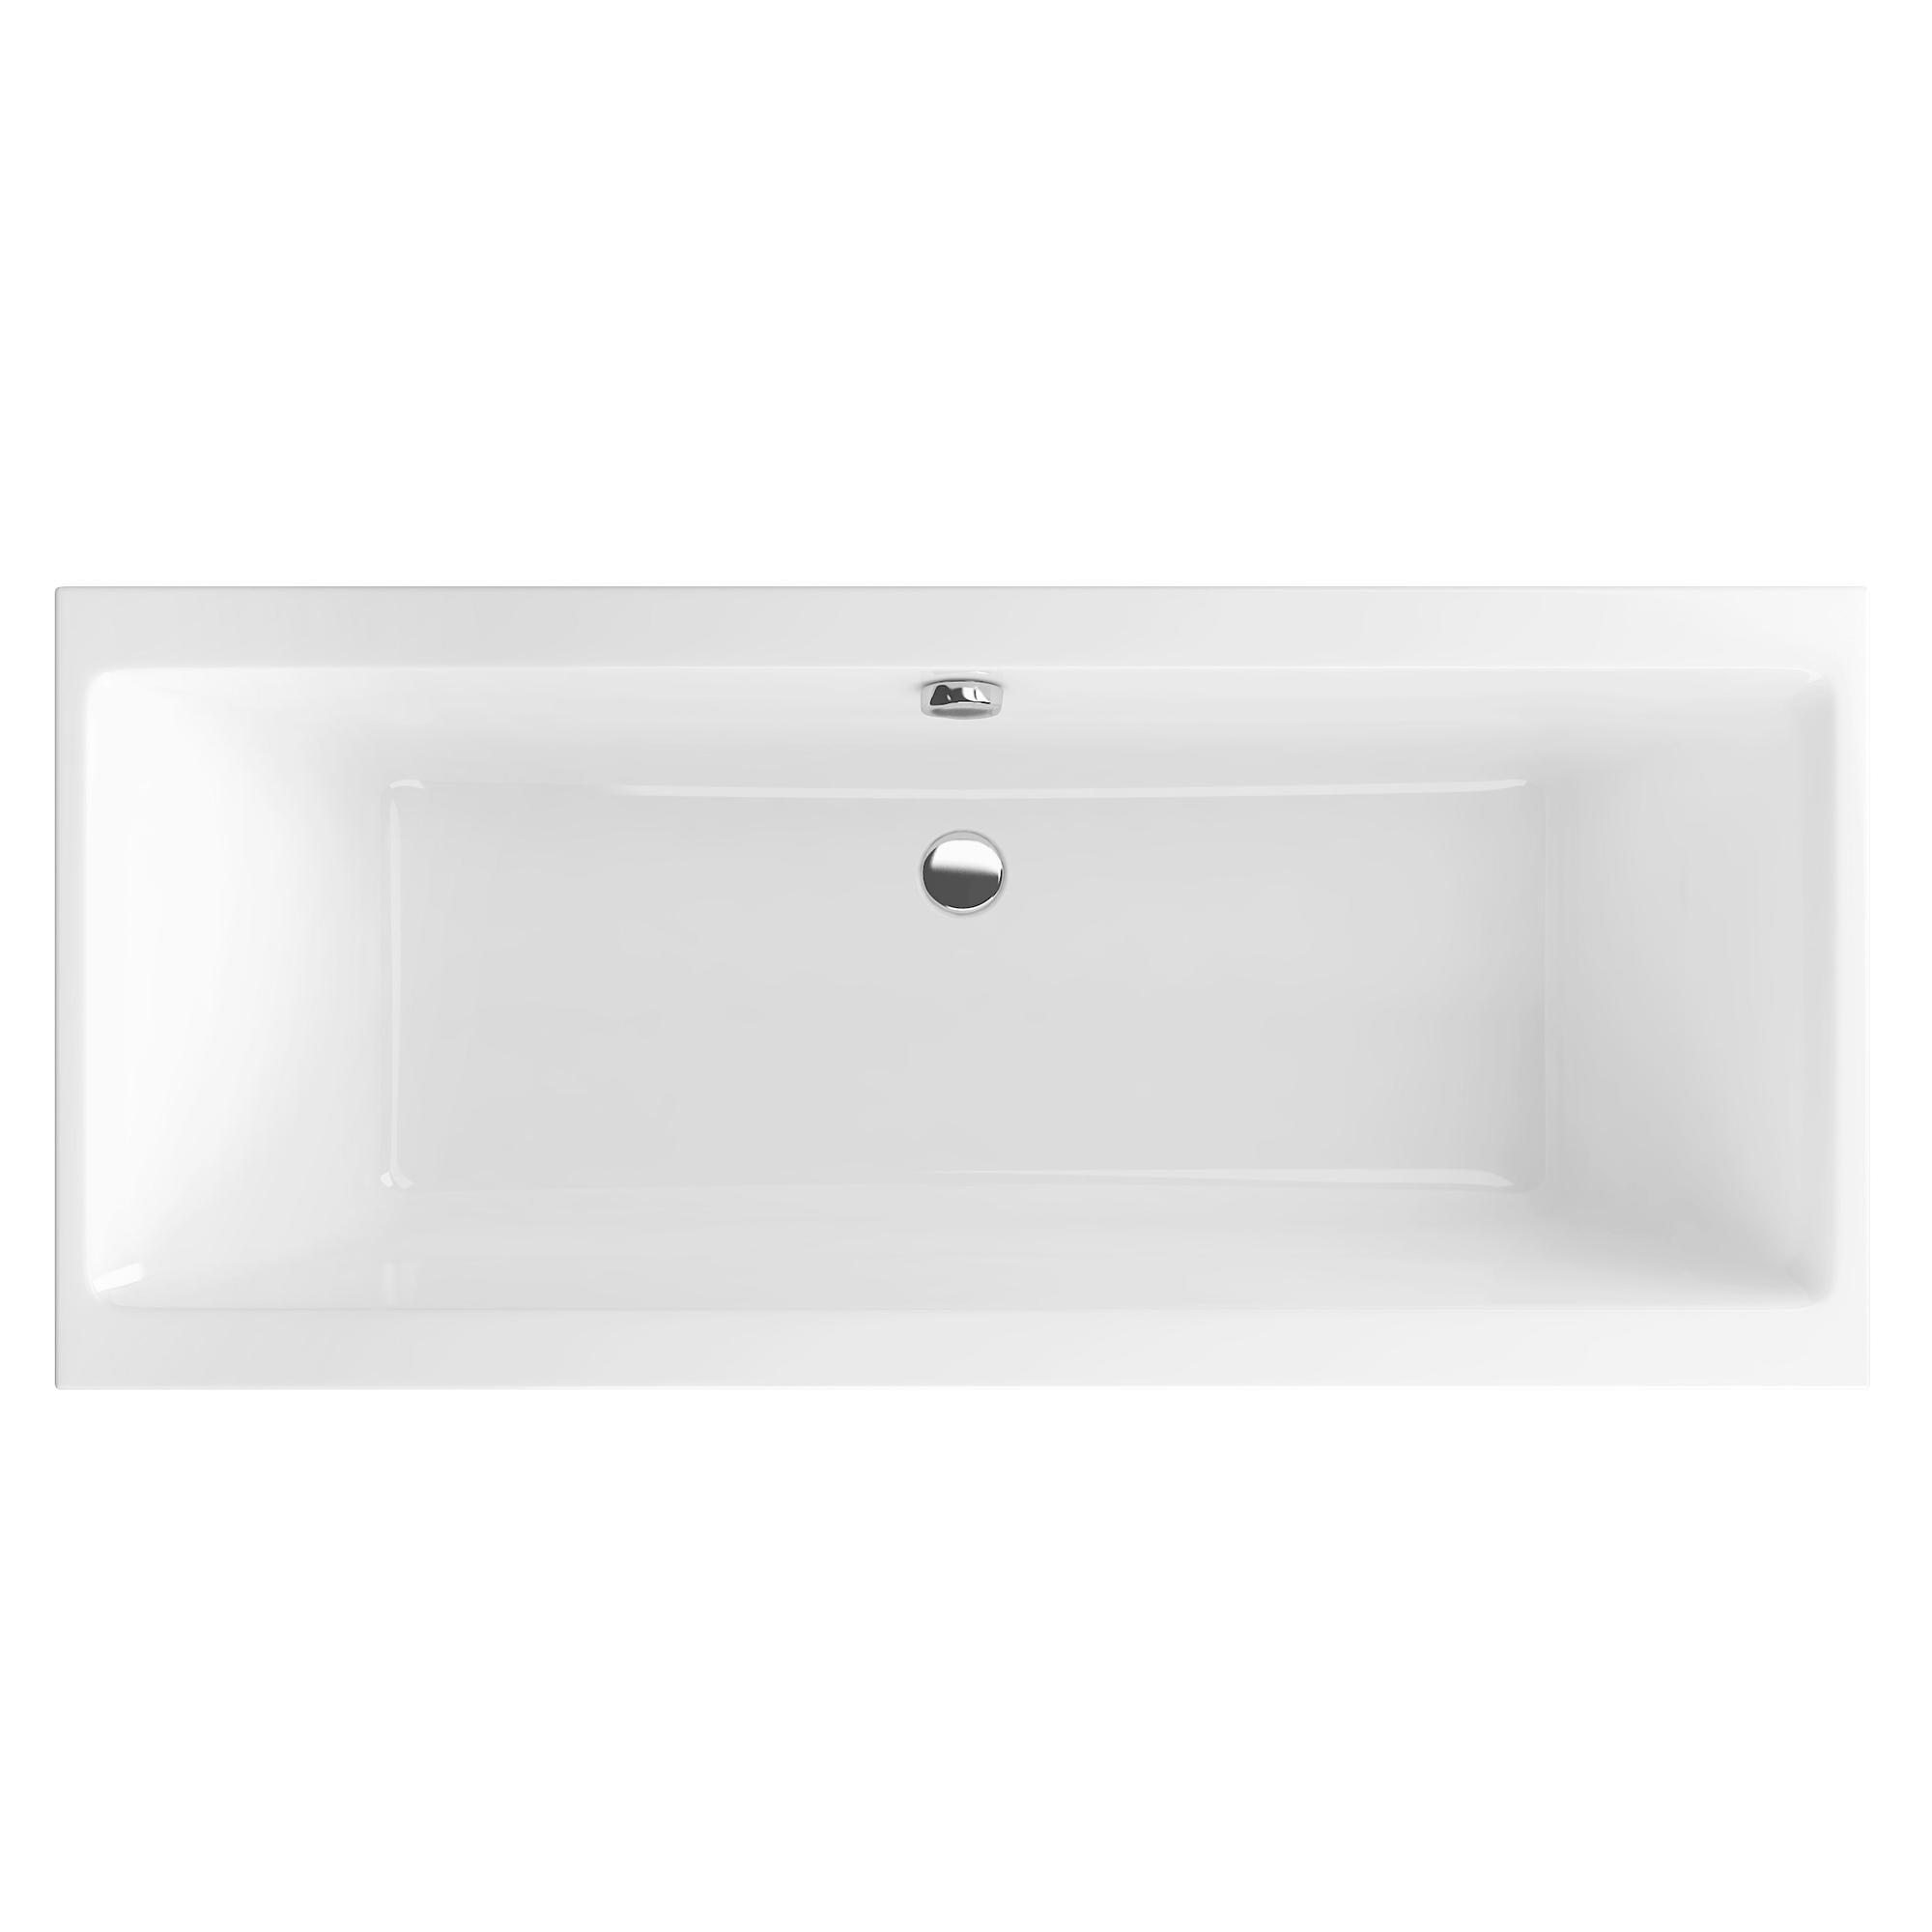 Акриловая ванна Excellent Pryzmat Slim 170x75 без гидромассажа excellent акриловая ванна excellent pryzmat lux 180x80 waex prl18wh